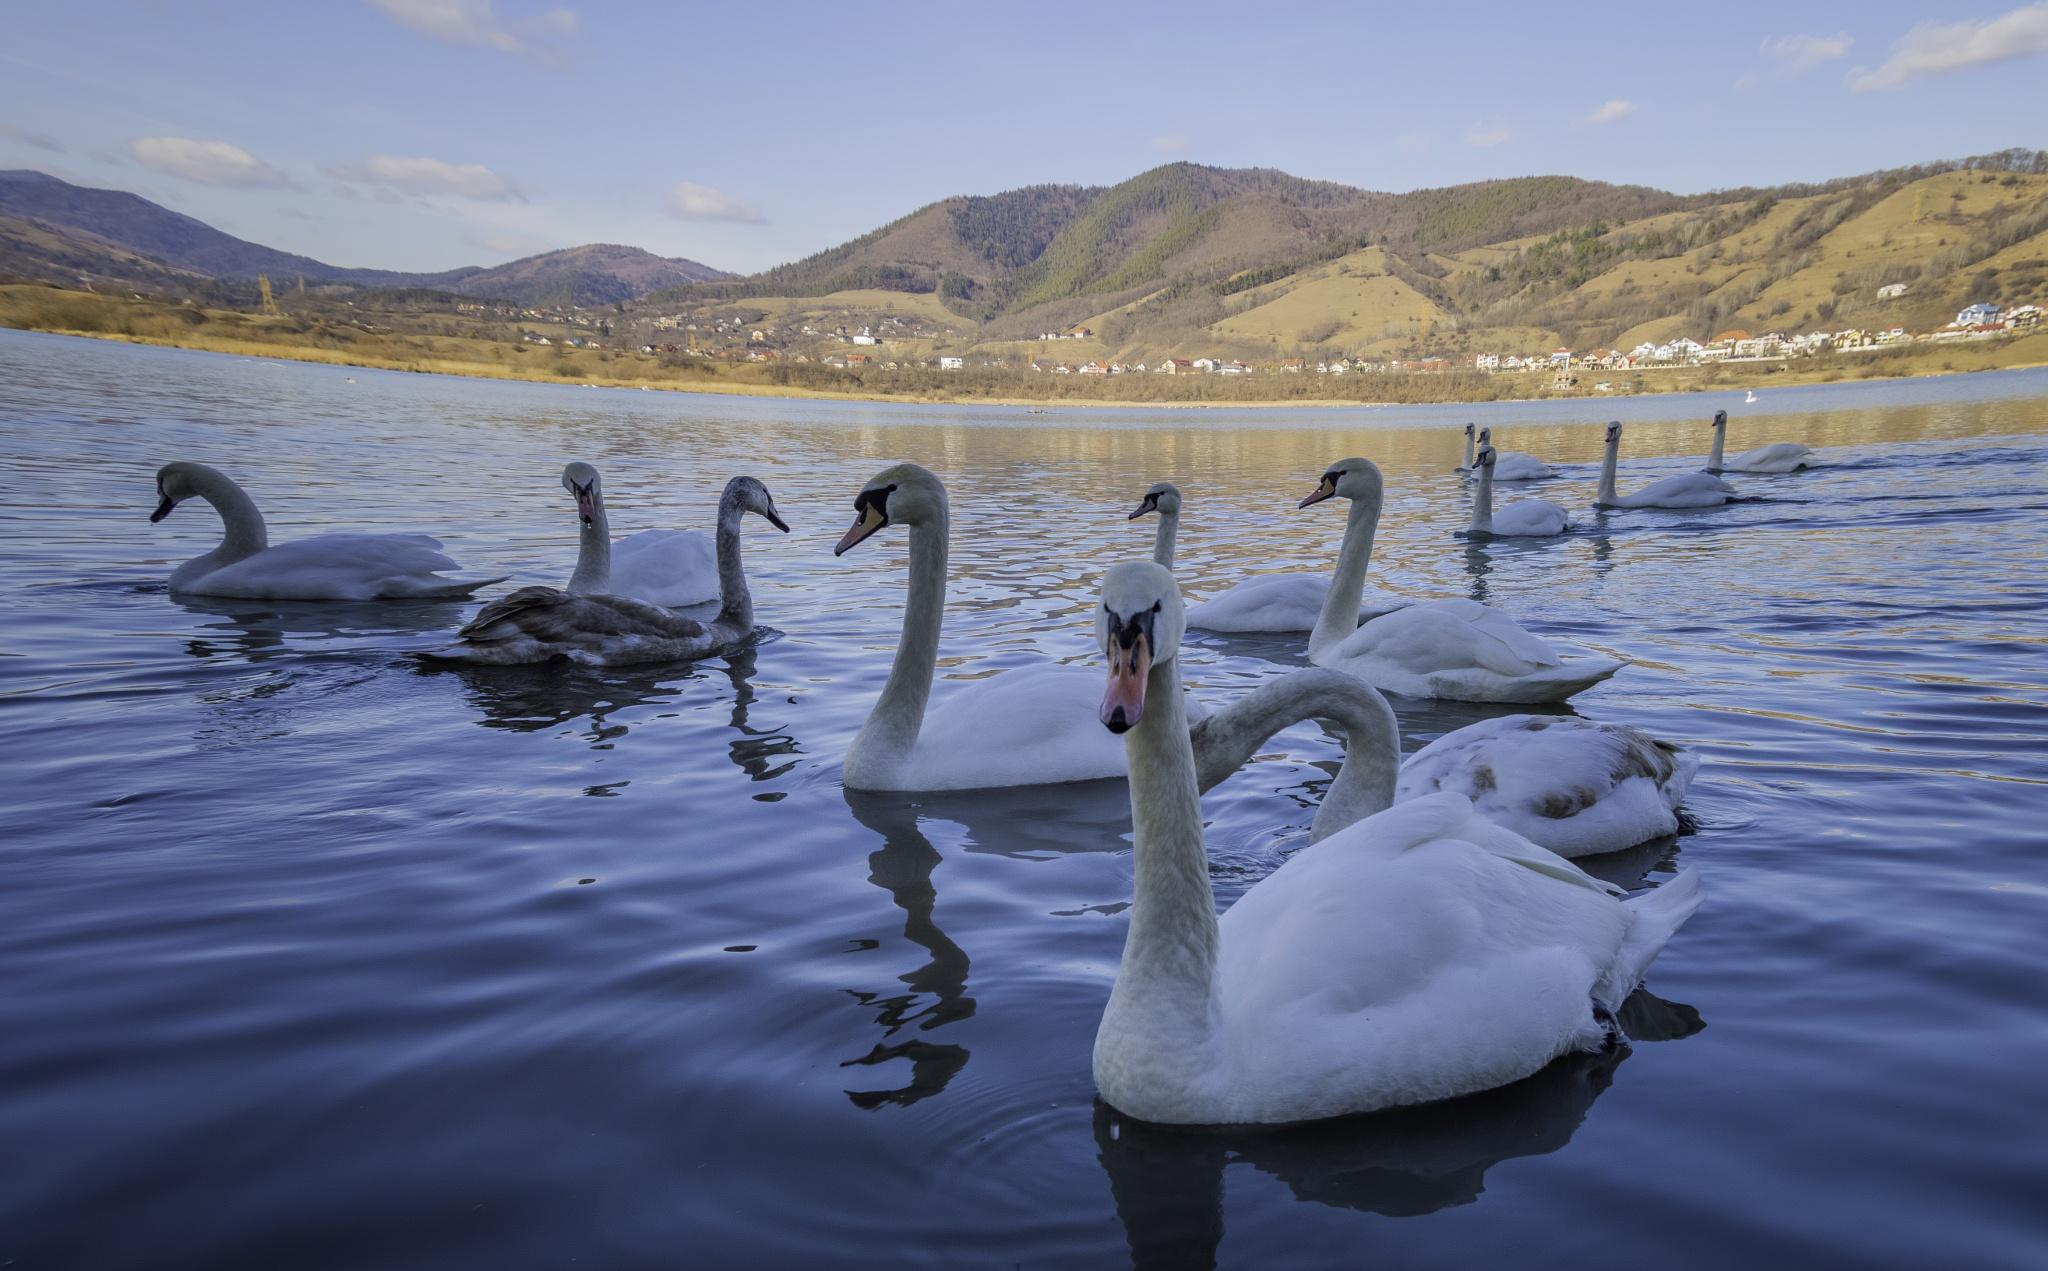 Swans on the Bistrita river, Romania by IonutAlexandru